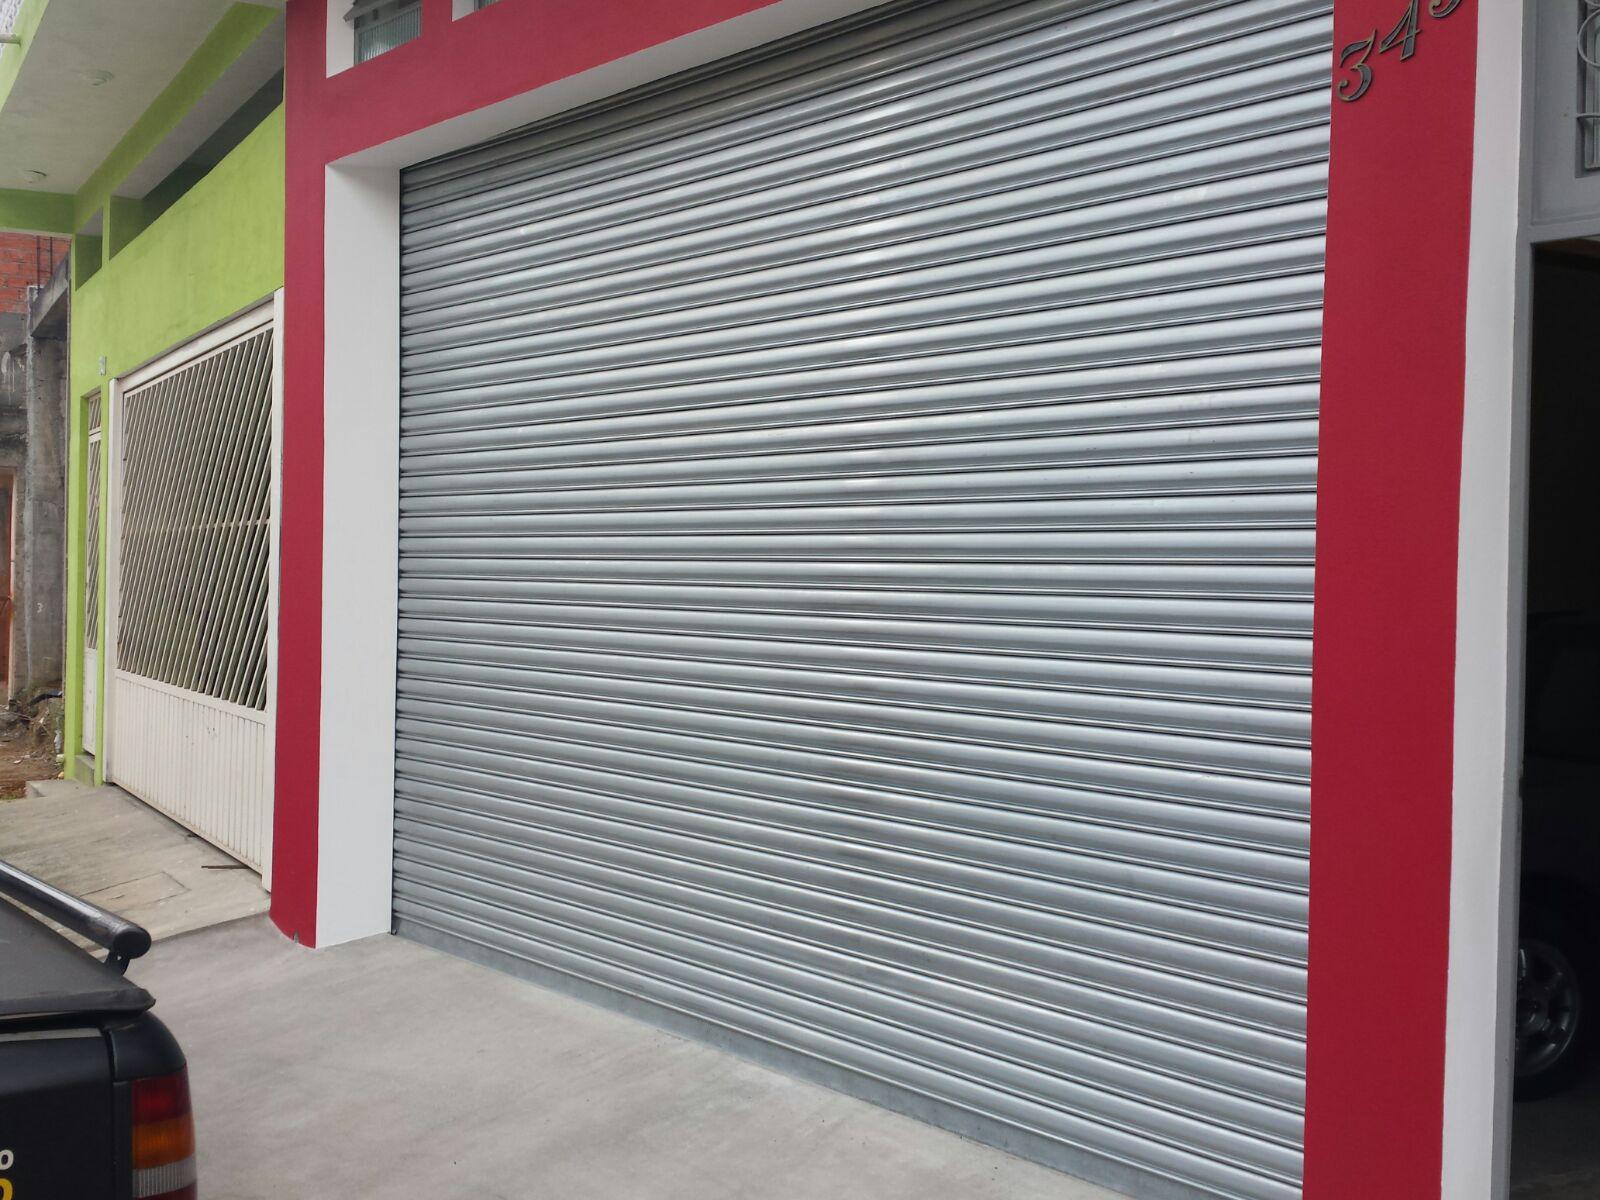 porta de enrolar - Porta Automática de Enrolar